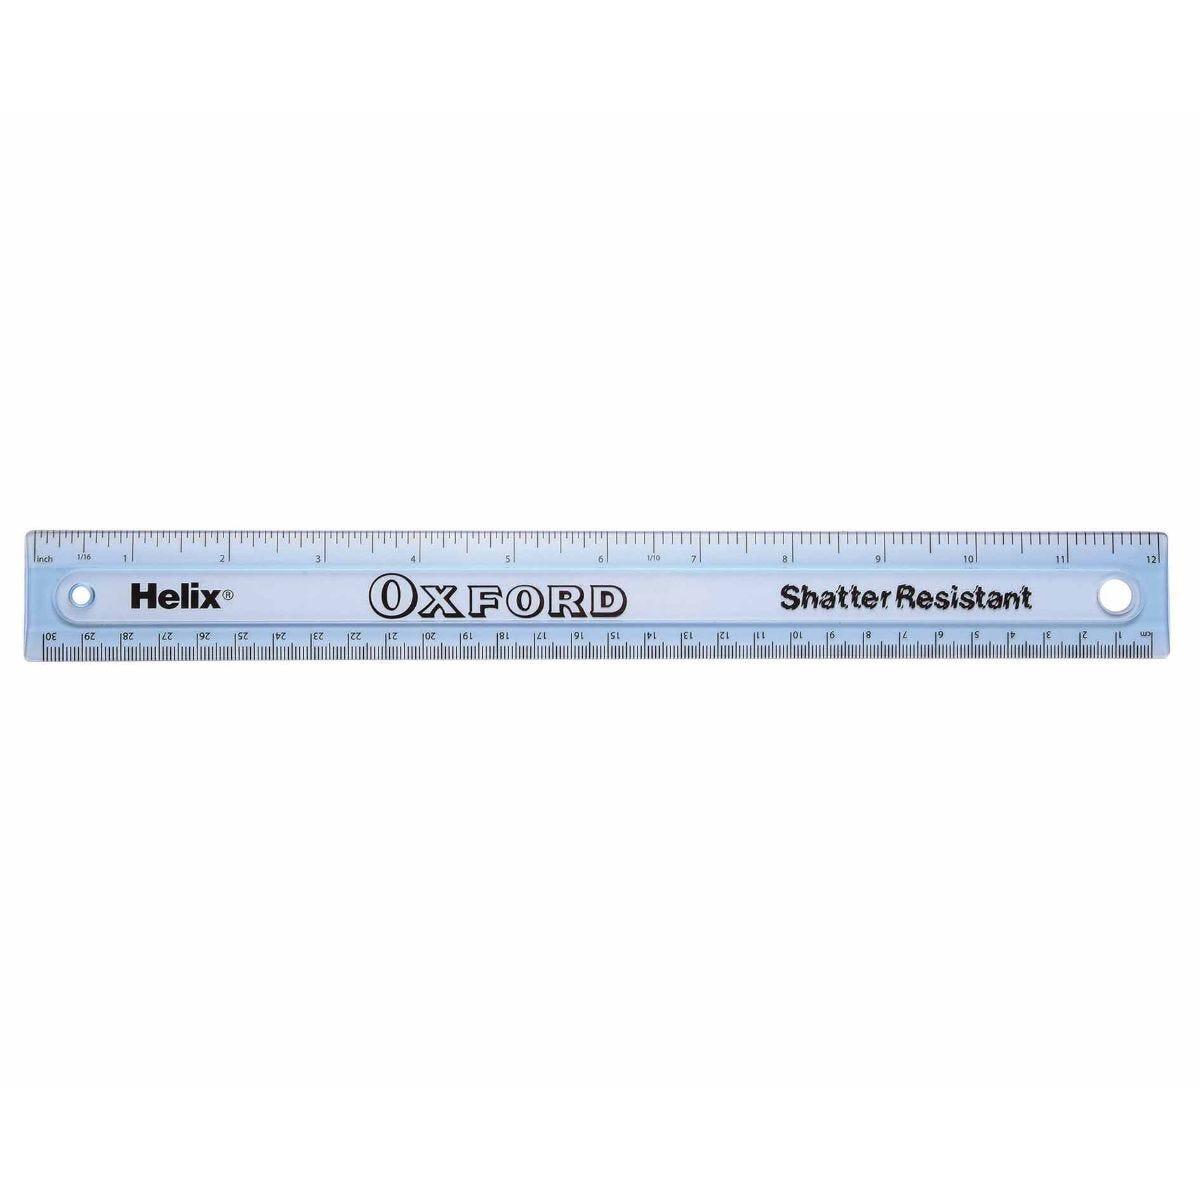 Helix Ruler 30cm Shatterproof